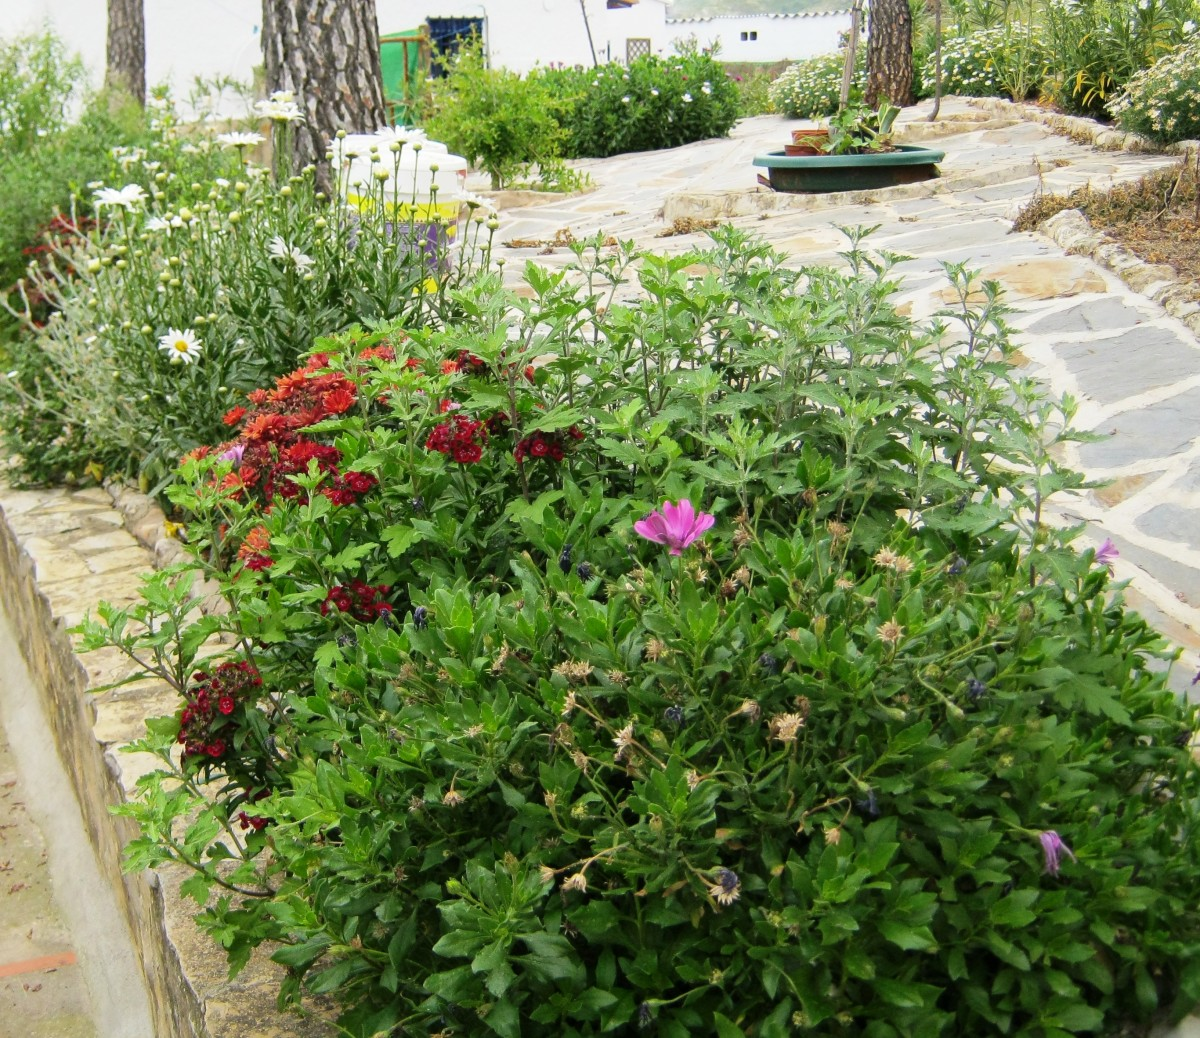 How To Make A Garden On A Budget Top Money Saving Tips